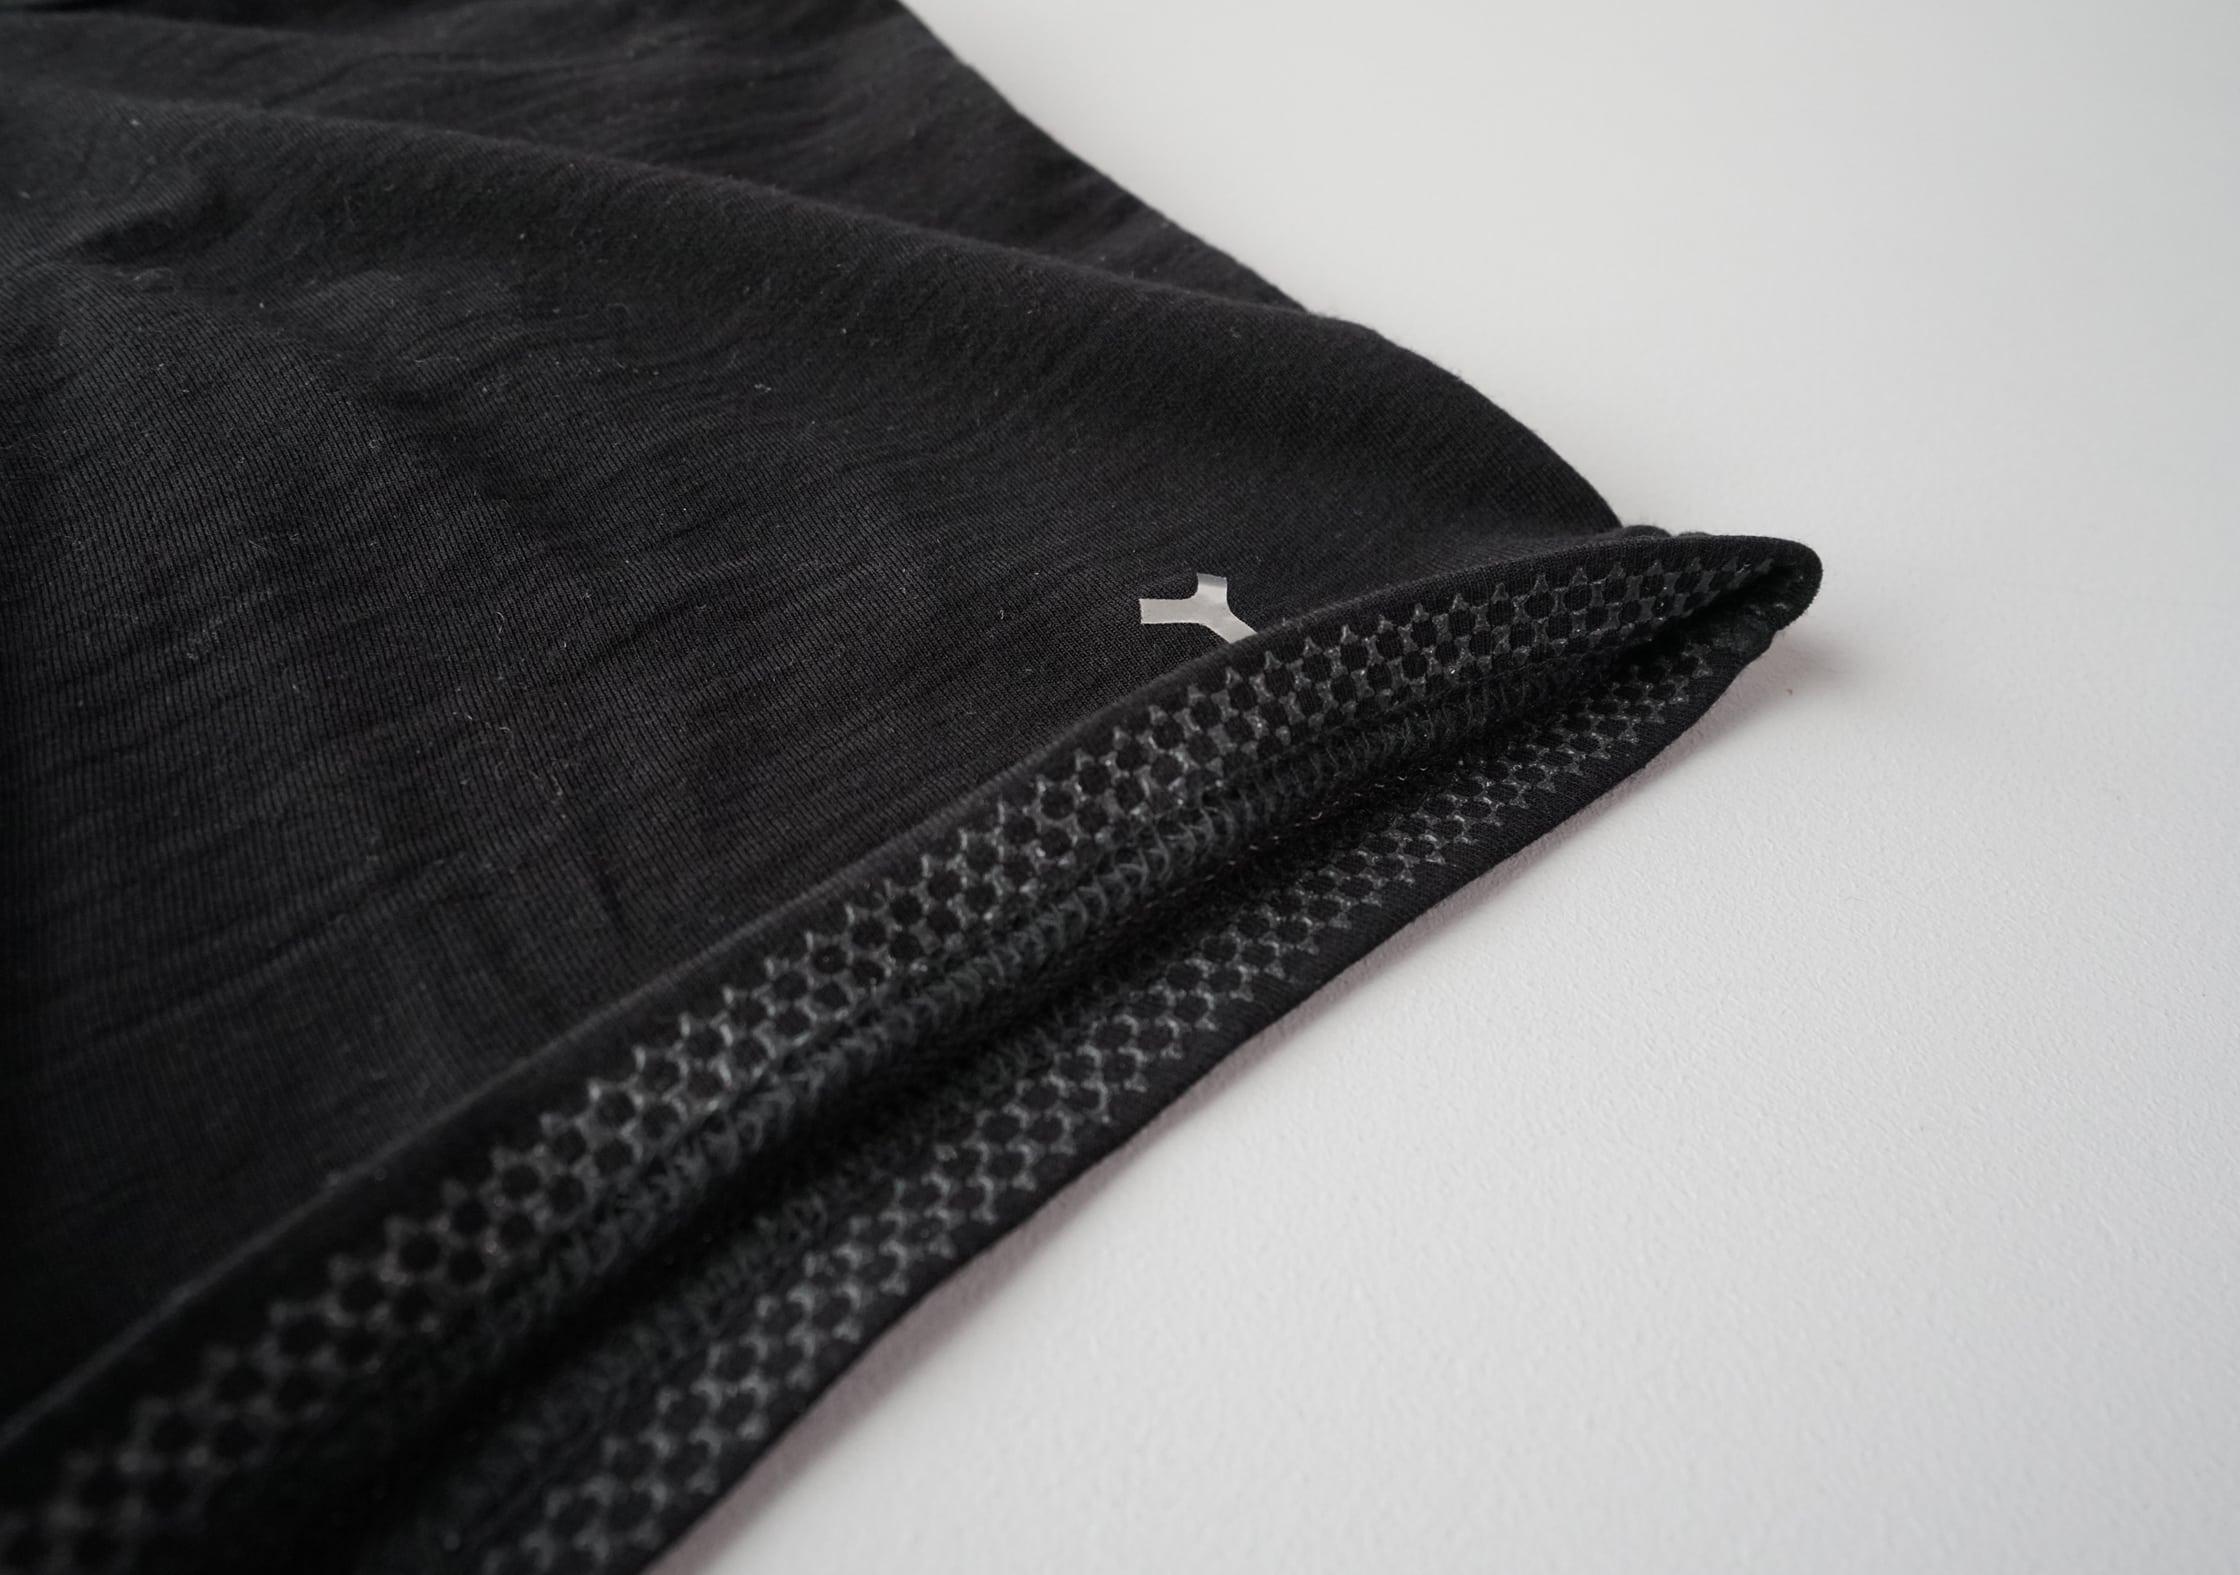 Y Athletics Merino Wool Boxer Brief Leg Grip System